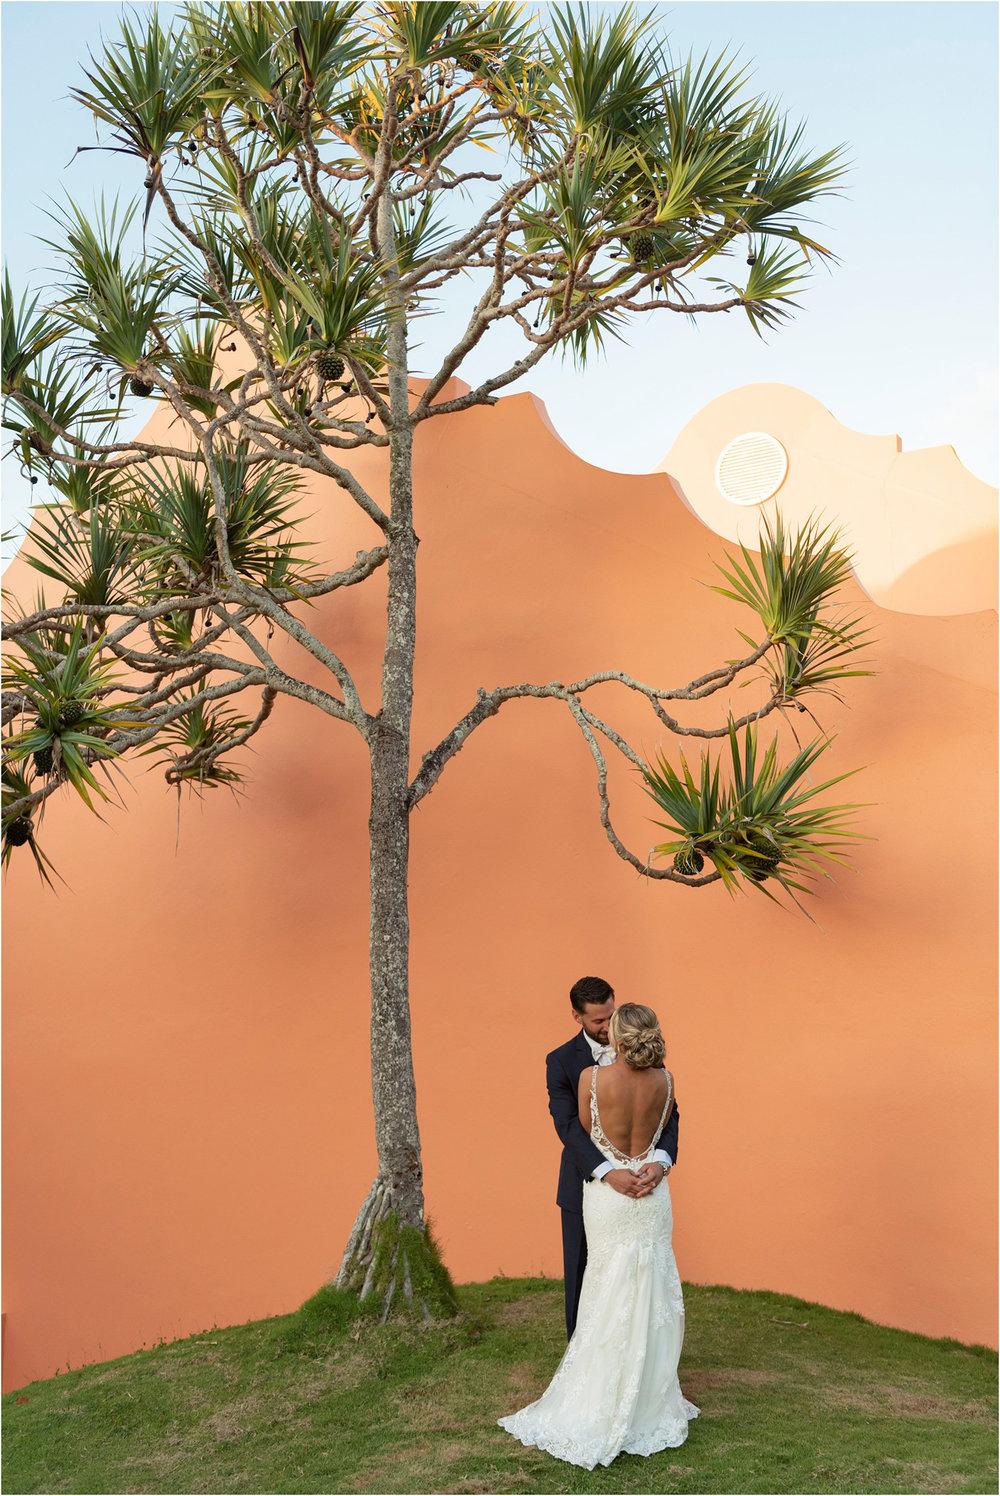 ©FianderFoto_Destination_Wedding_Photographer_Bermuda_Wedding_Photographer_Jaclyn_Anthony__Grotto Bay_117.jpg